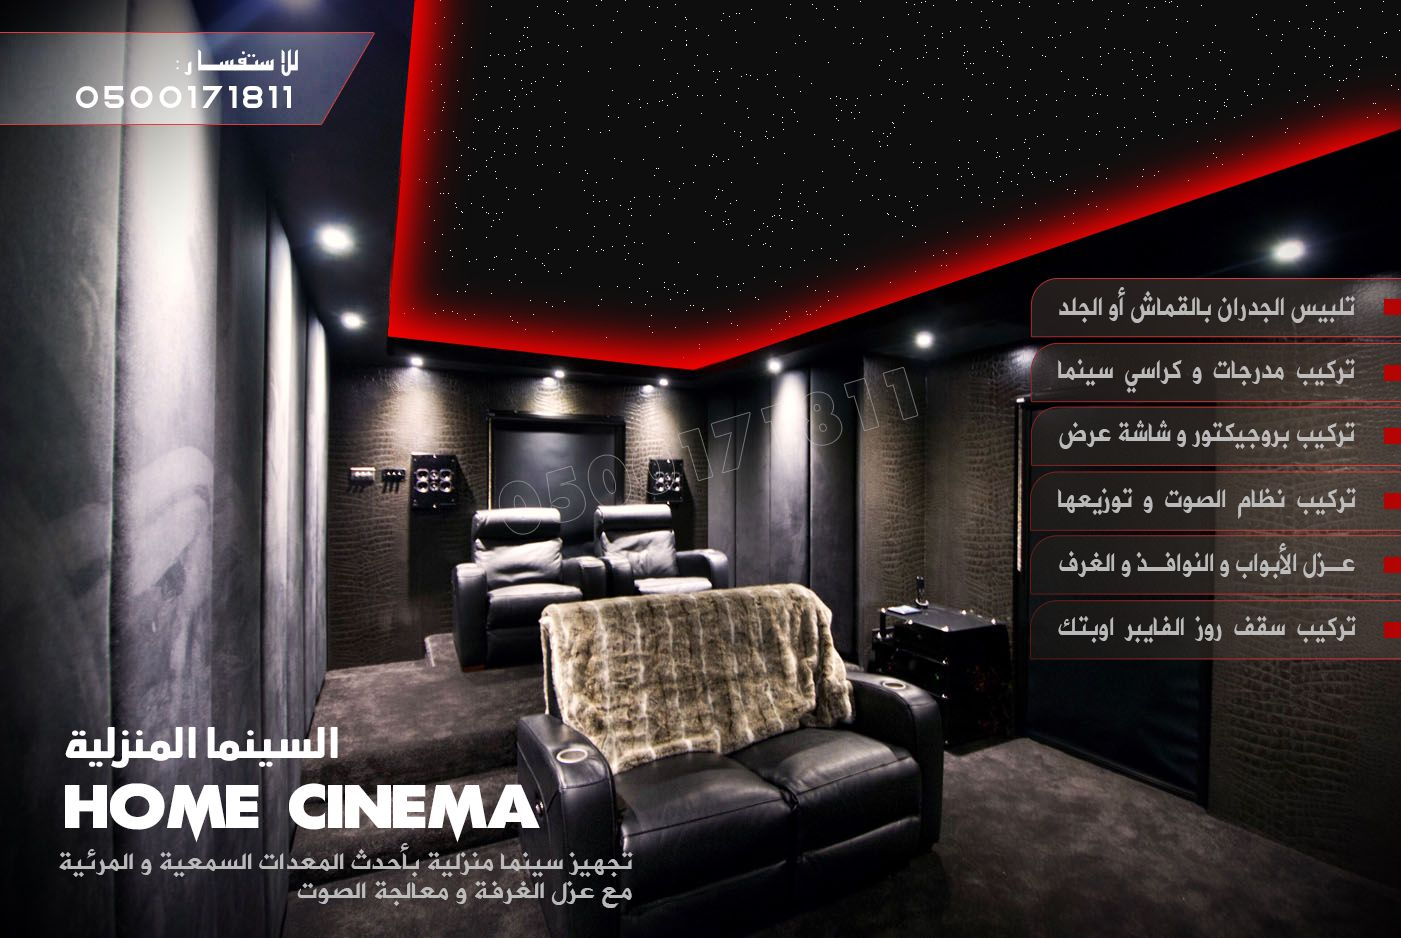 سينما منزلية و سقف روز بالرياض Home Cinemas Cinema Home